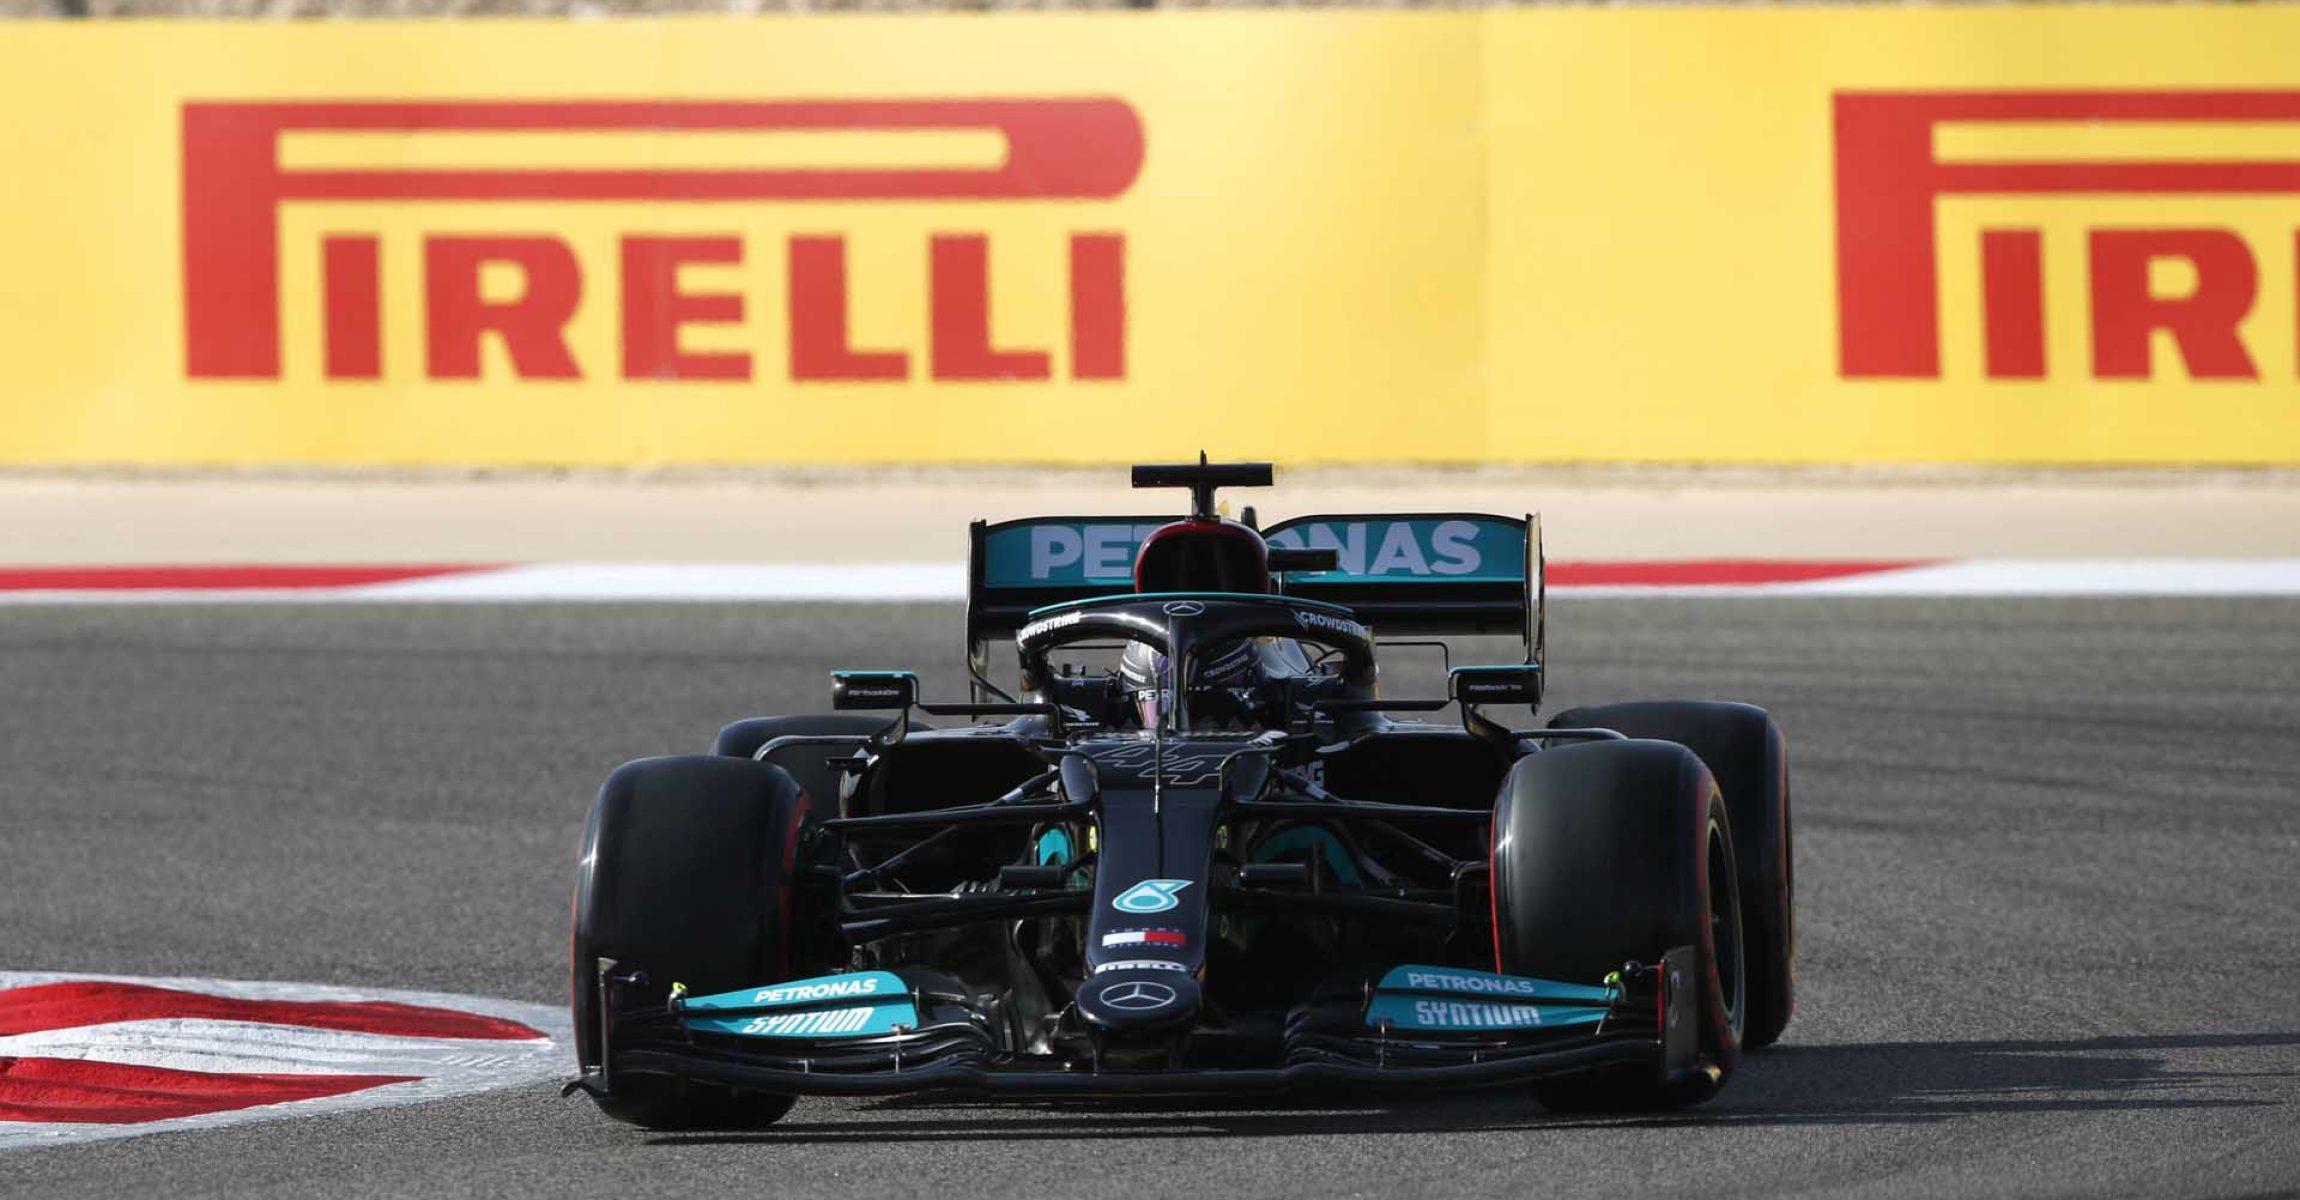 BAHRAIN INTERNATIONAL CIRCUIT, BAHRAIN - MARCH 27: Sir Lewis Hamilton, Mercedes W12 during the Bahrain GP at Bahrain International Circuit on Saturday March 27, 2021 in Sakhir, Bahrain. (Photo by Charles Coates / LAT Images)